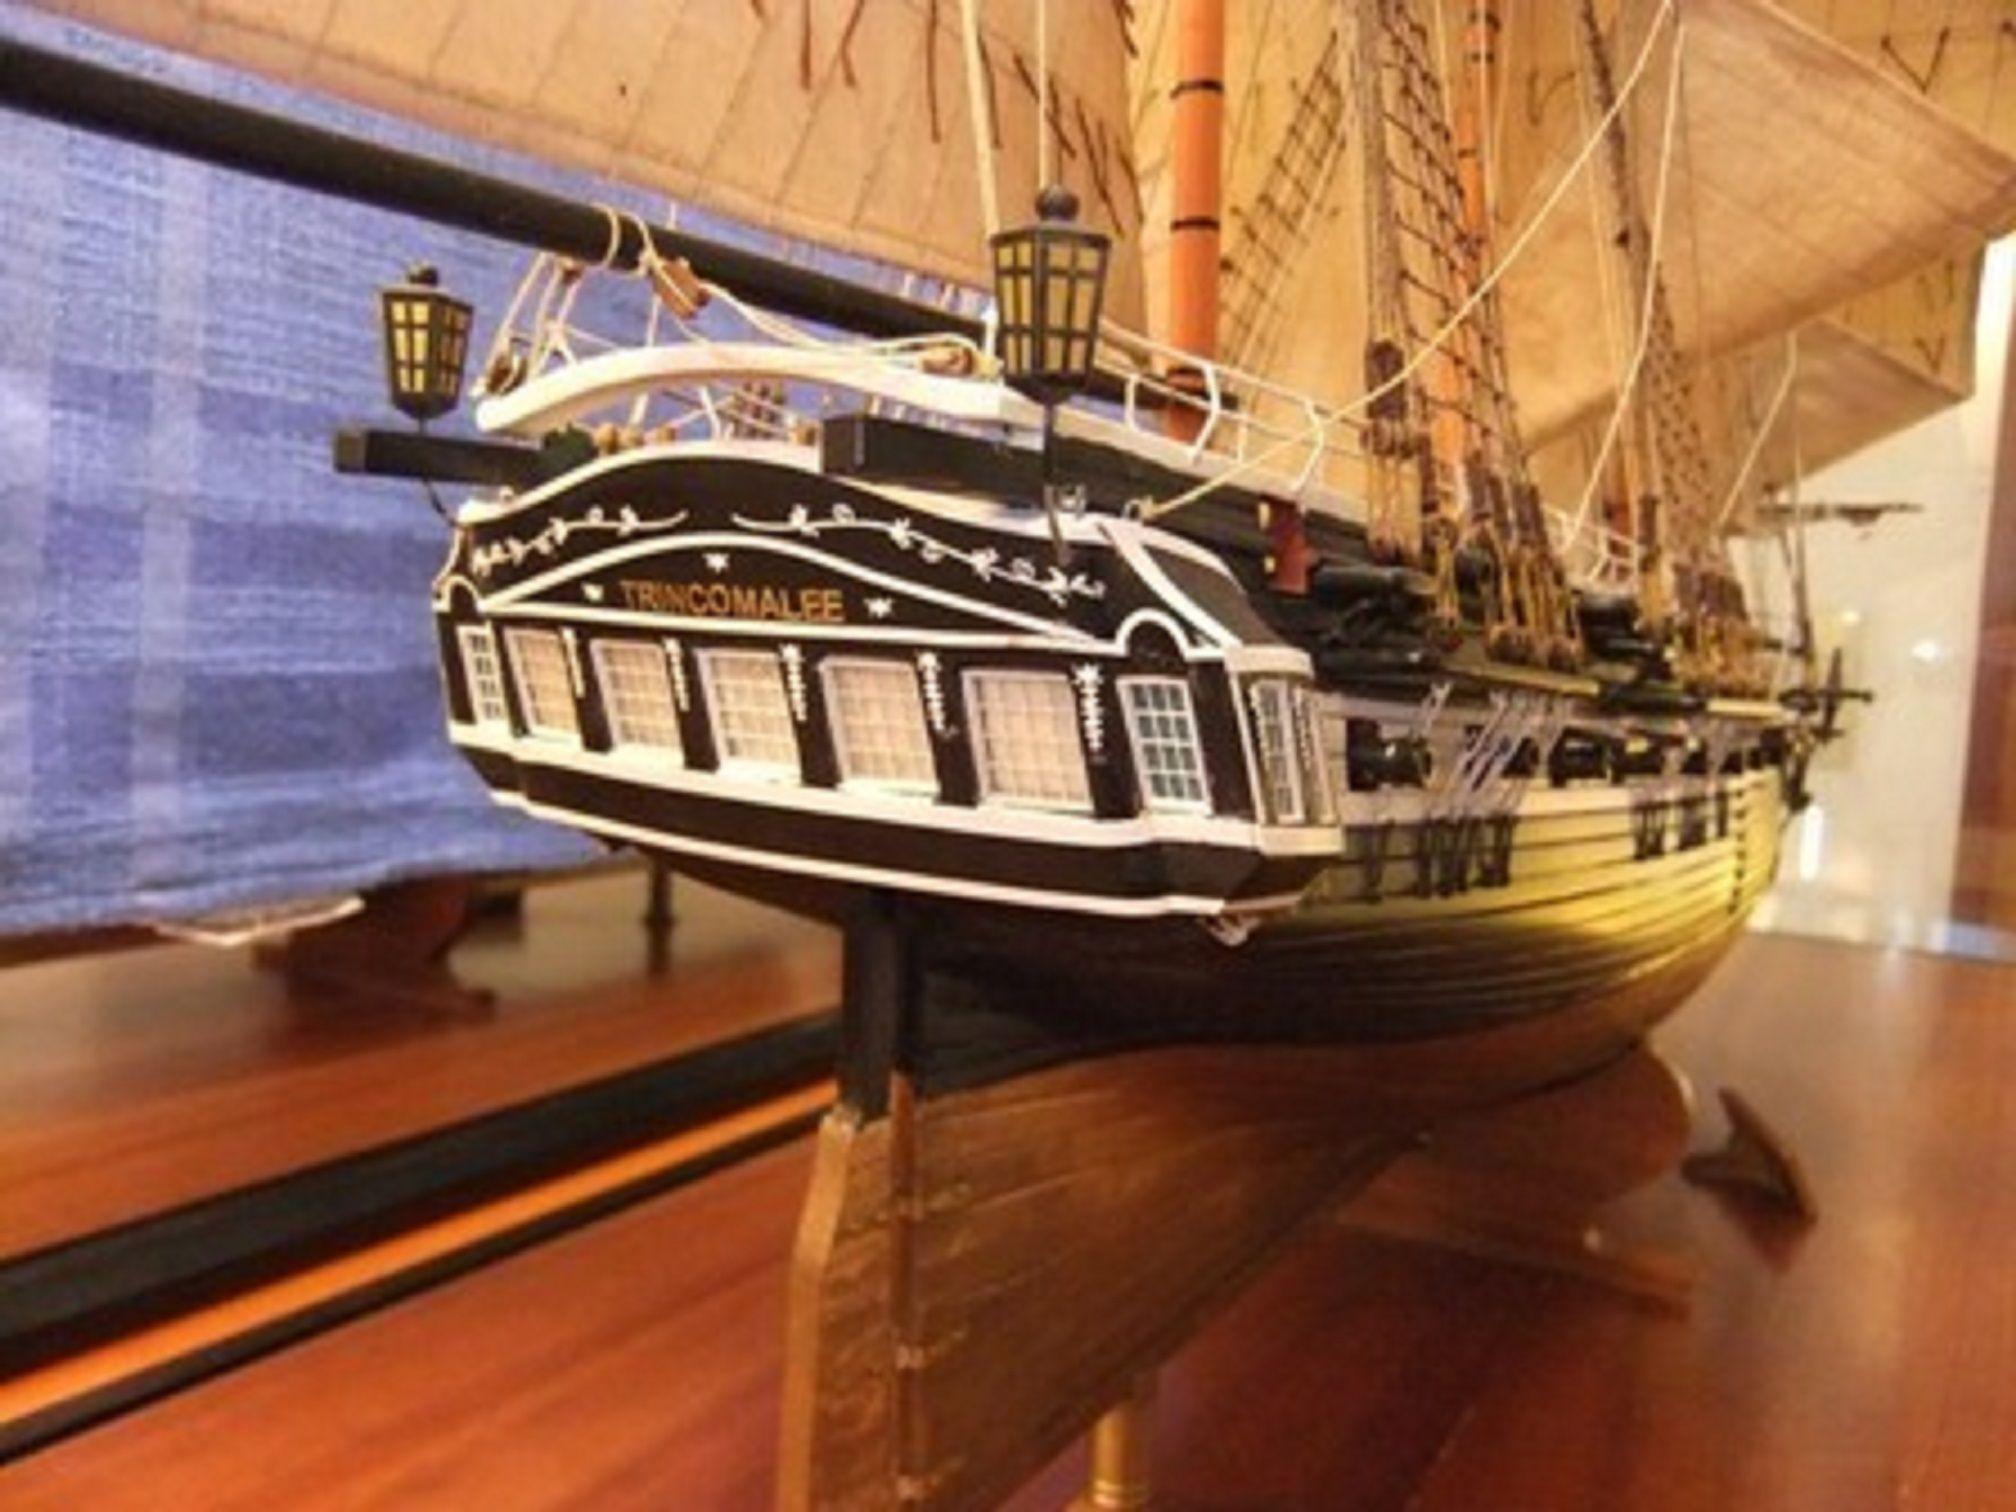 1059-7421-HMS-Trincomalee-Ship-Model-Premier-Range